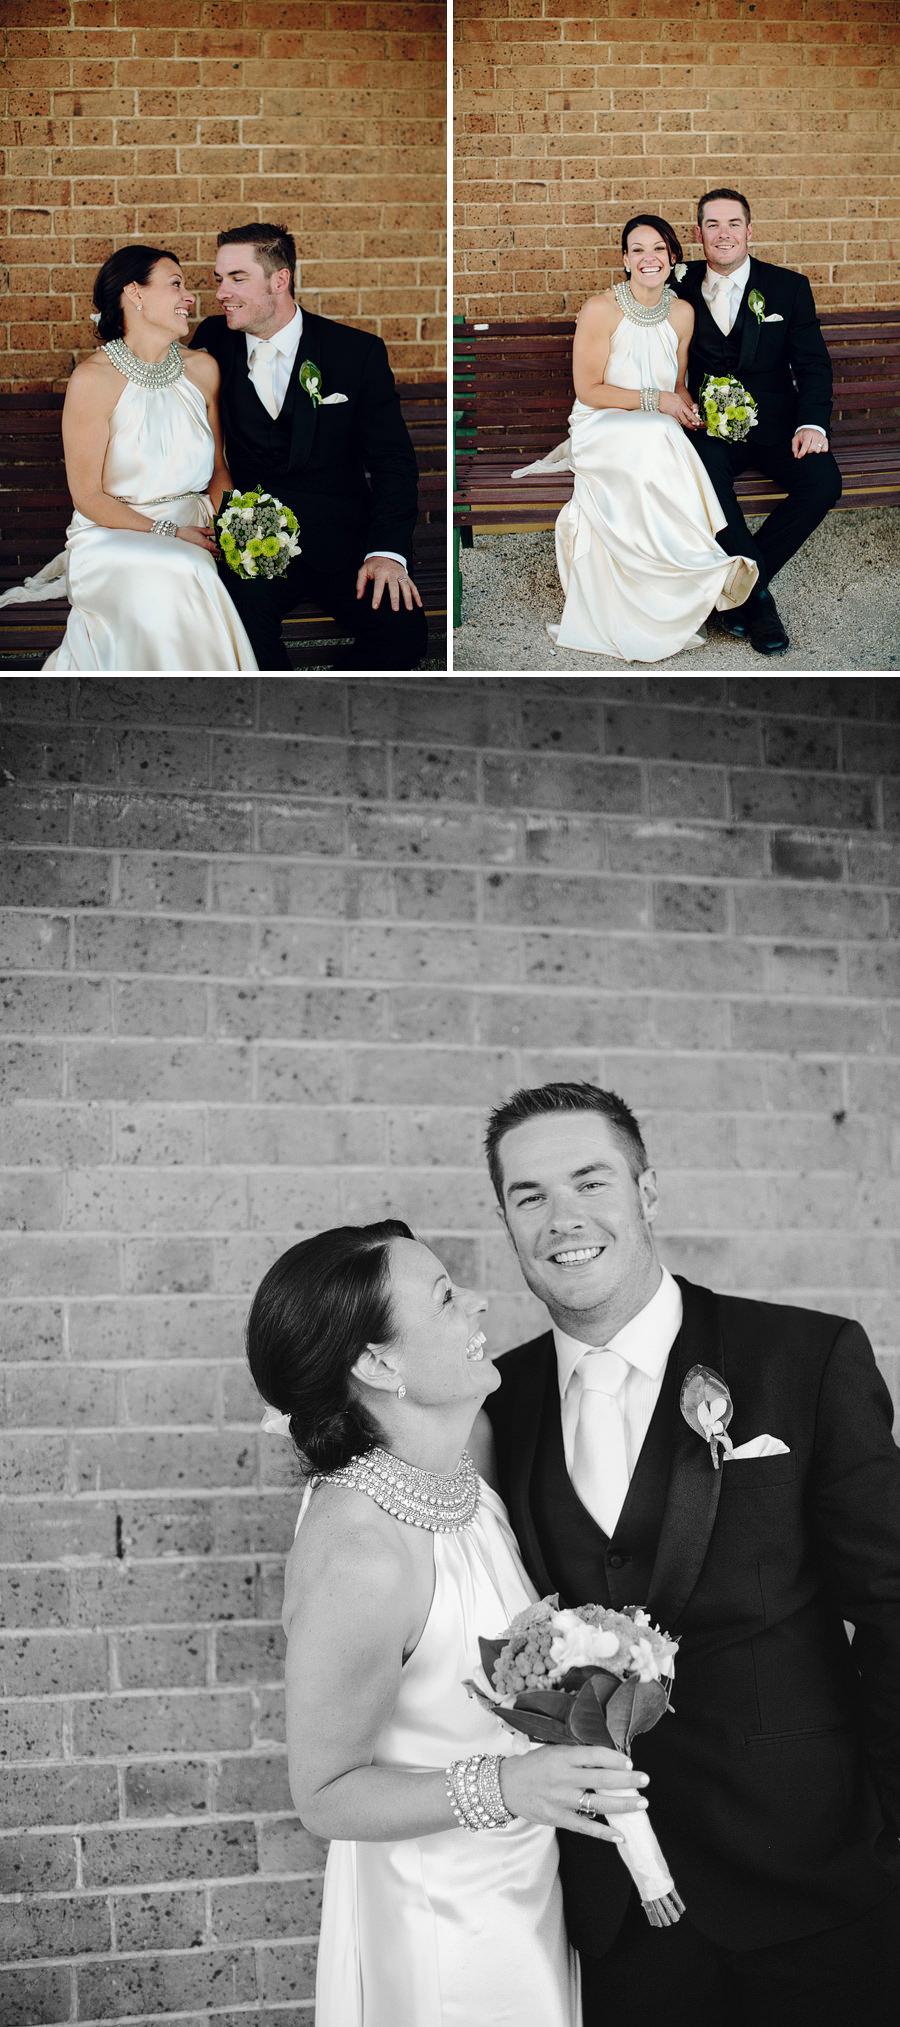 Bathurst Wedding Photographer: Bridal Party Portraits